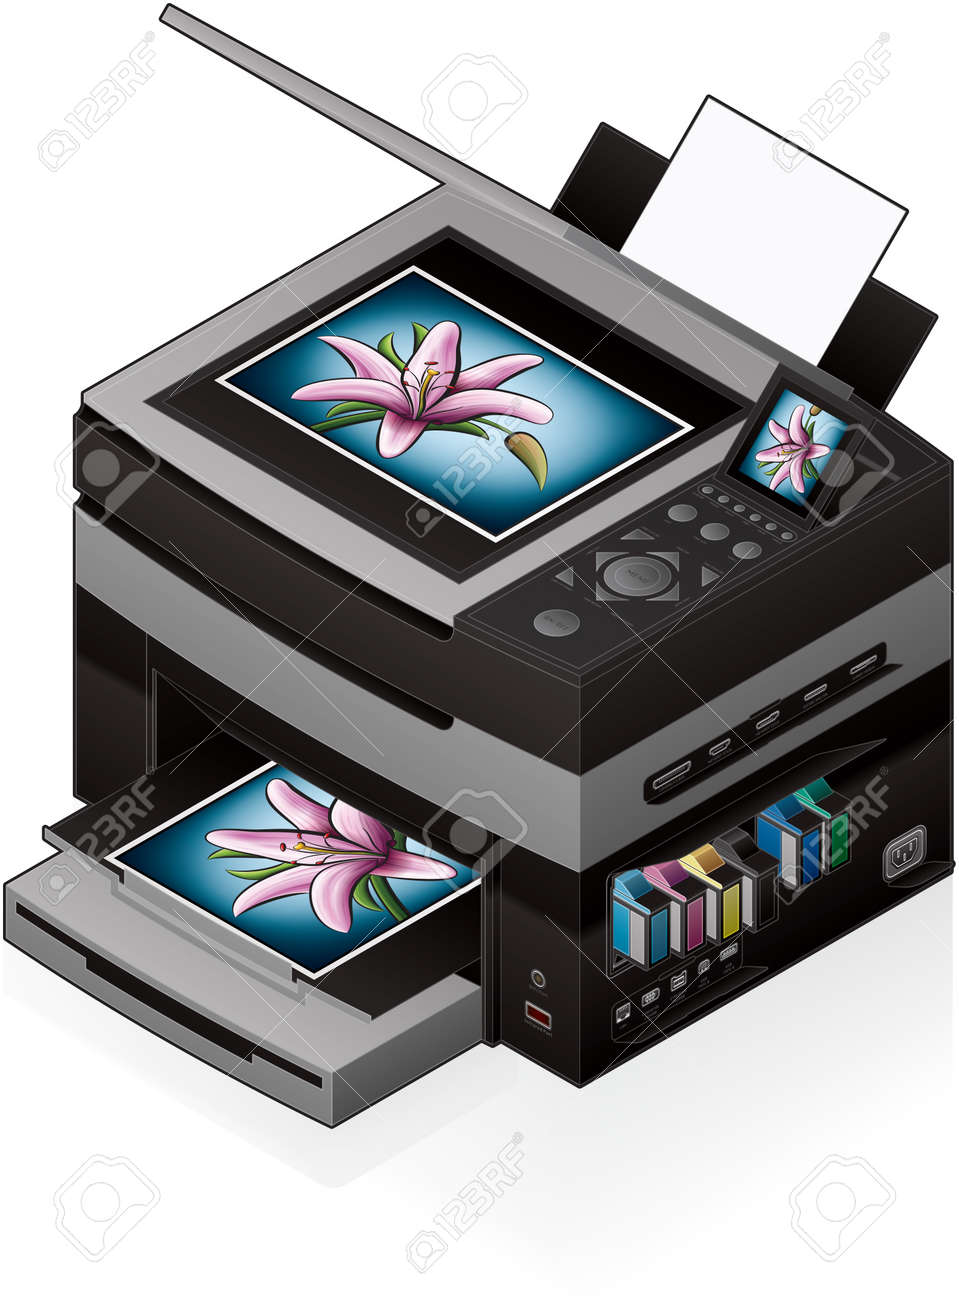 3D Isometric Office Color Photo InkJet Printer Stock Vector - 9550019